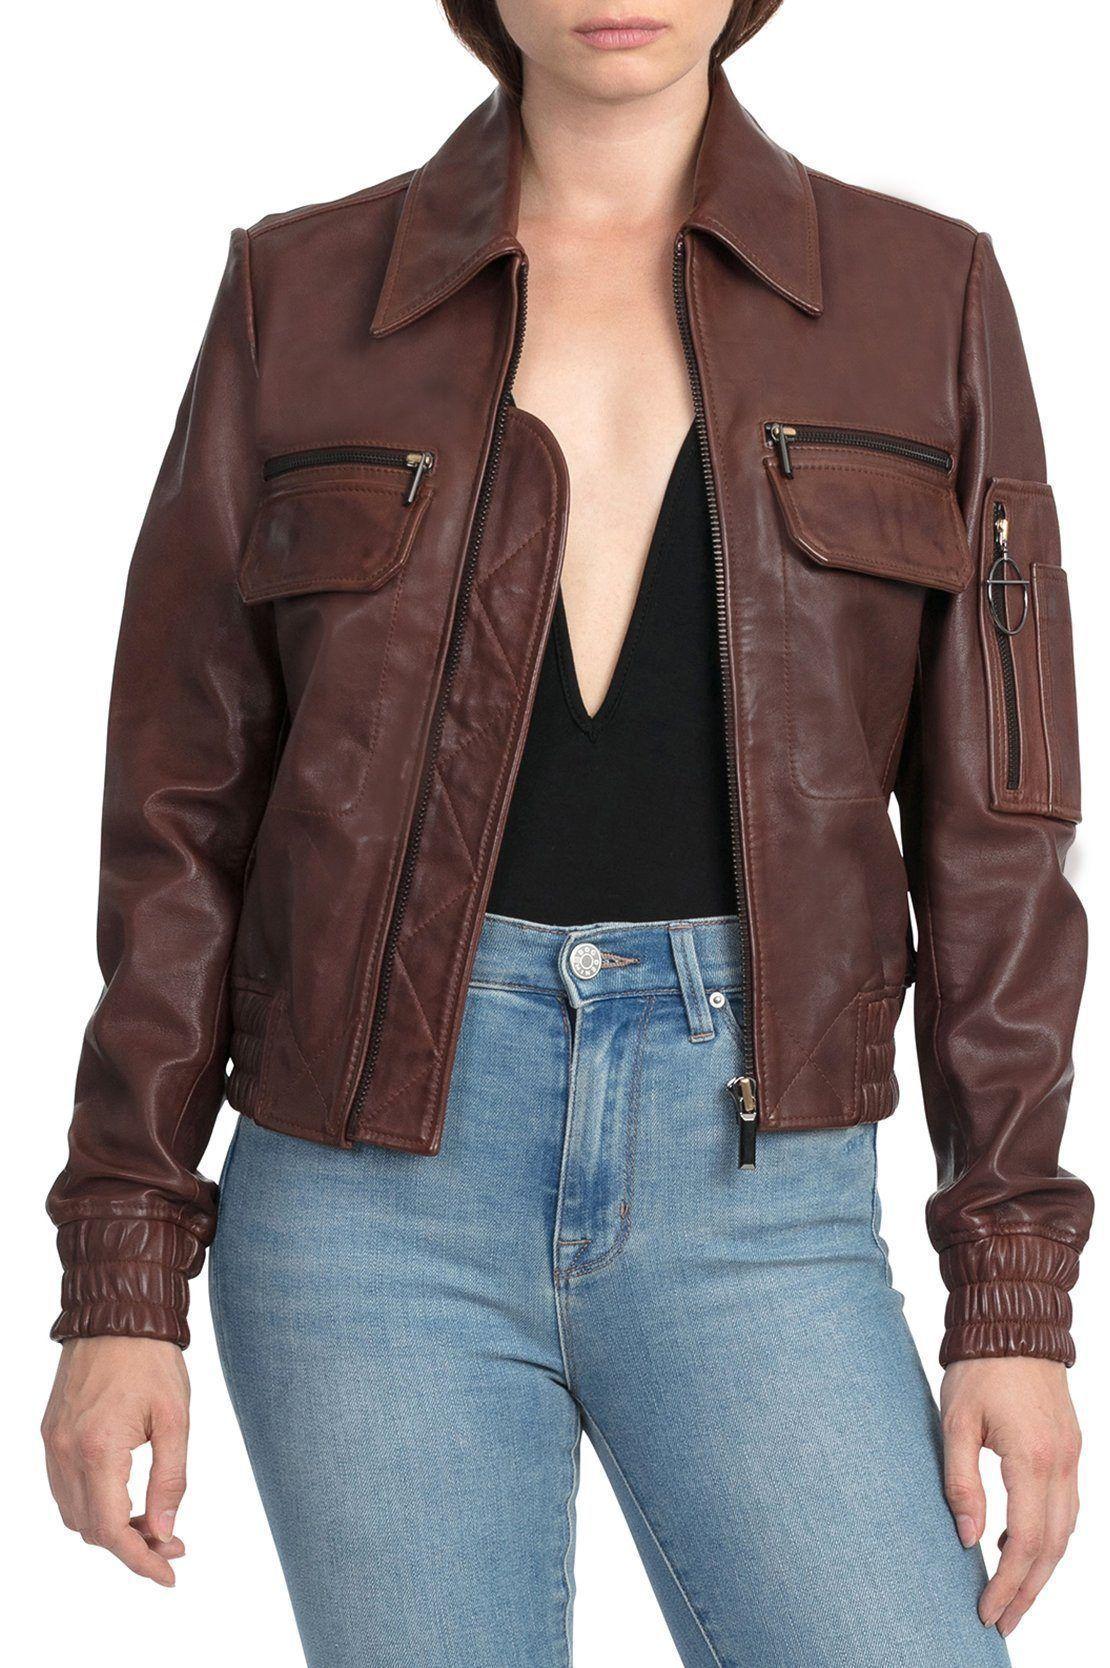 Mahogany (With images) Aviator leather jacket, Leather